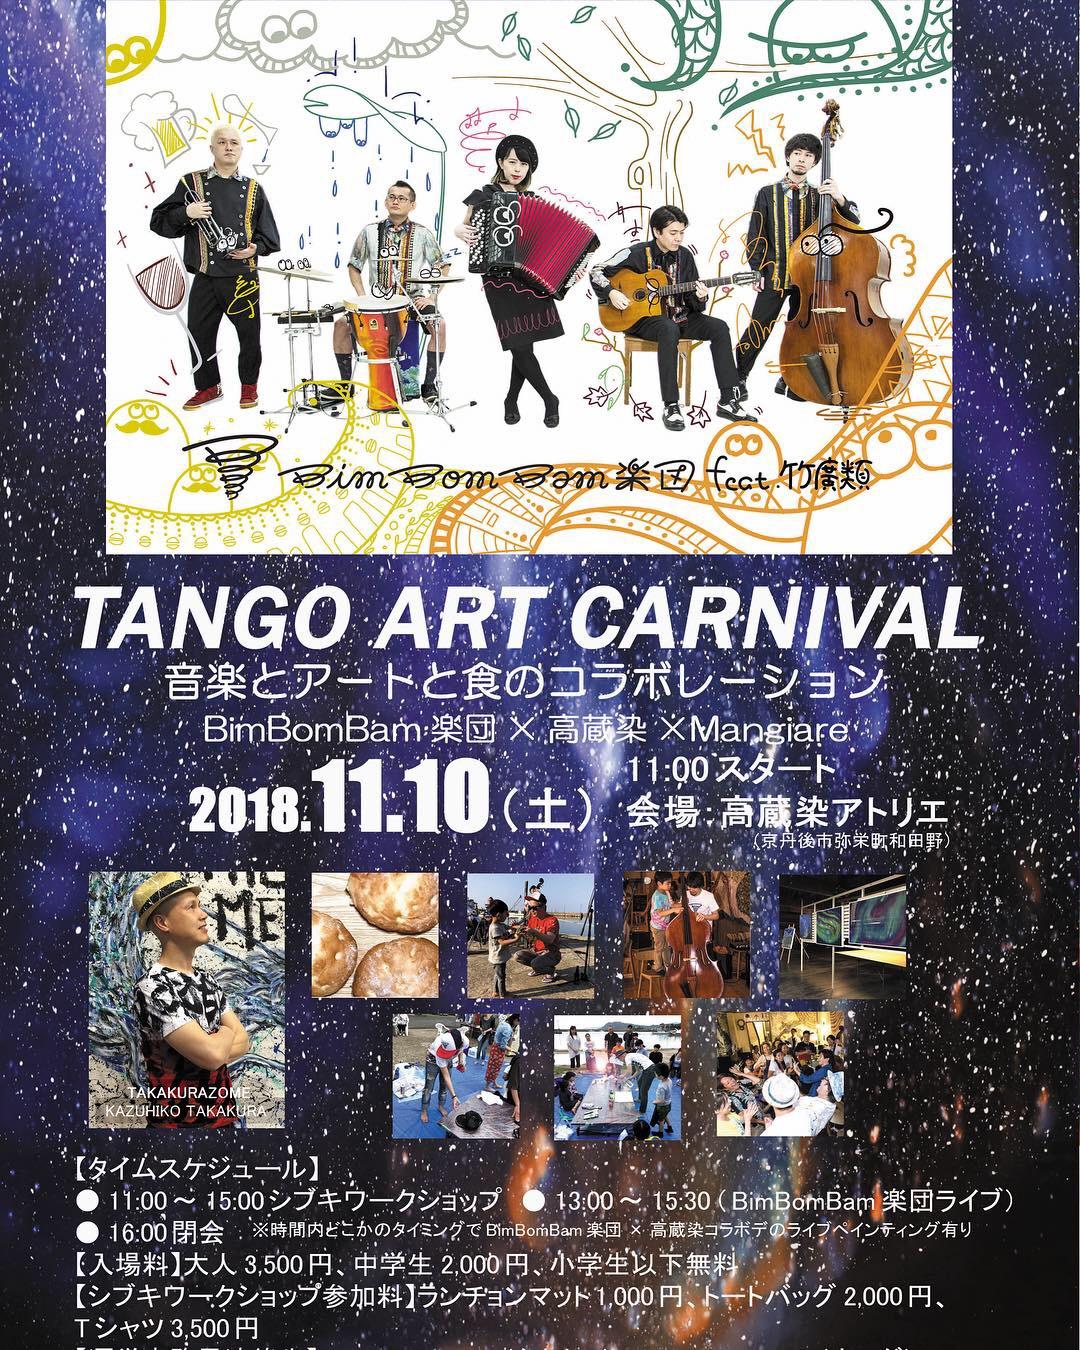 TANGO ART CARNIVAL